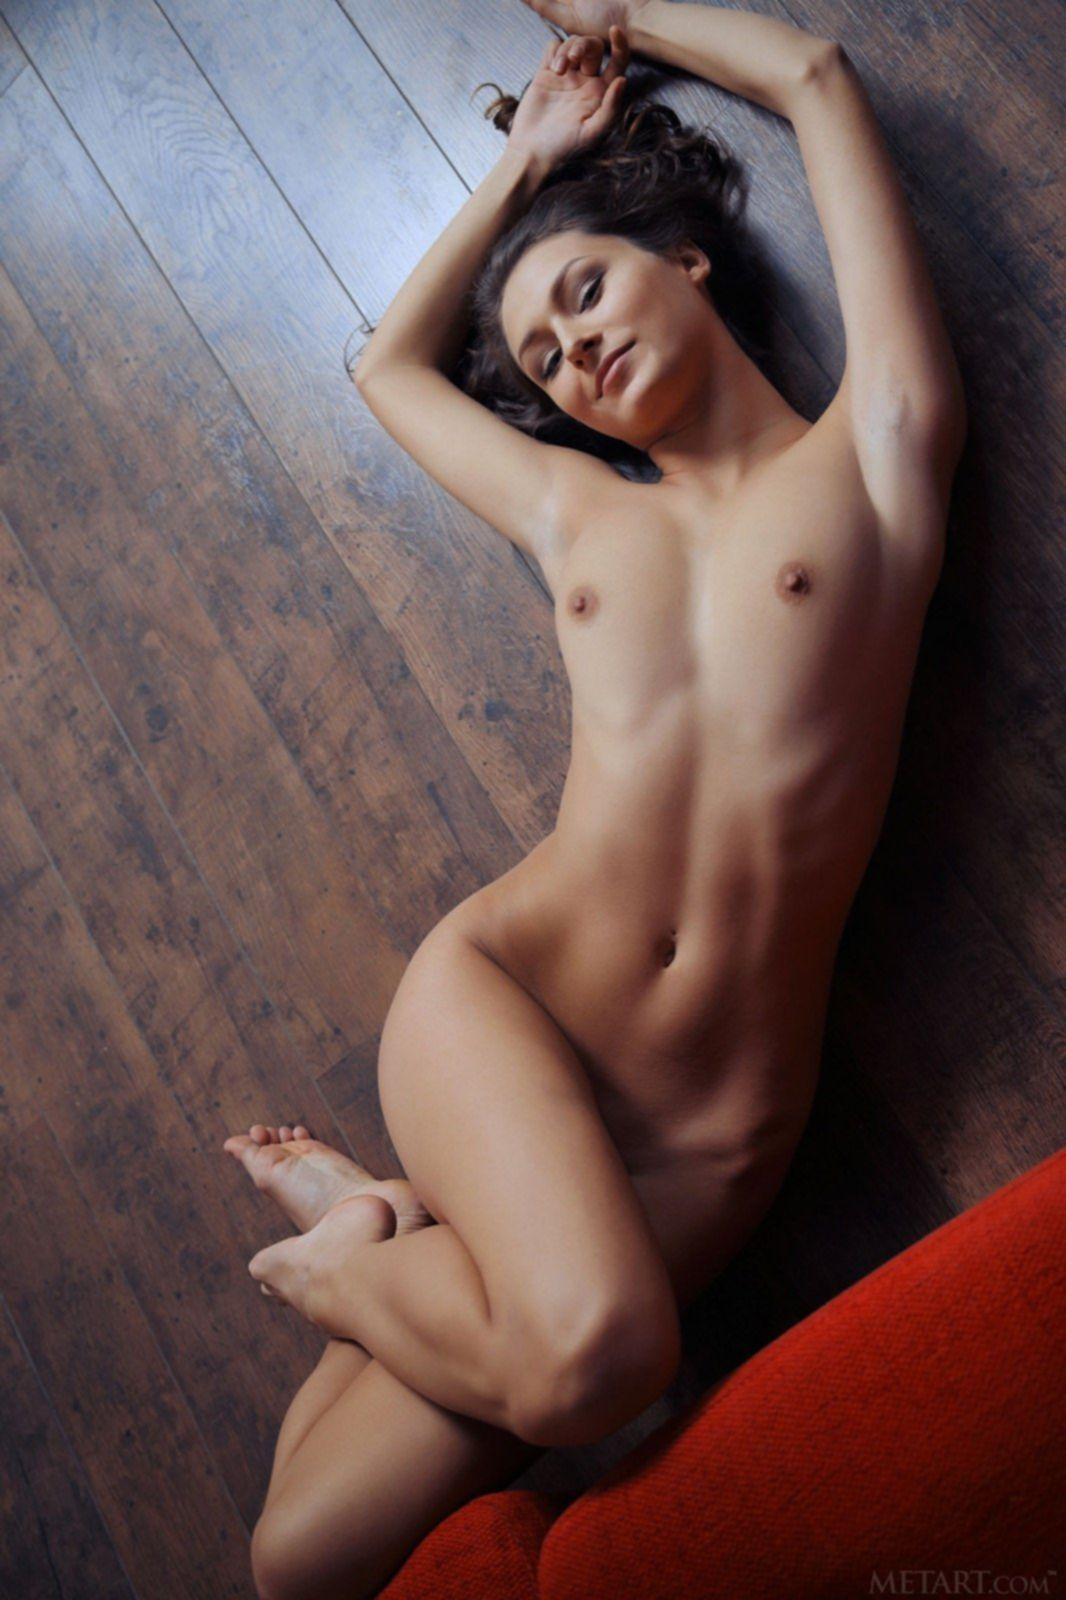 Красивая жопа упругой девушки - фото